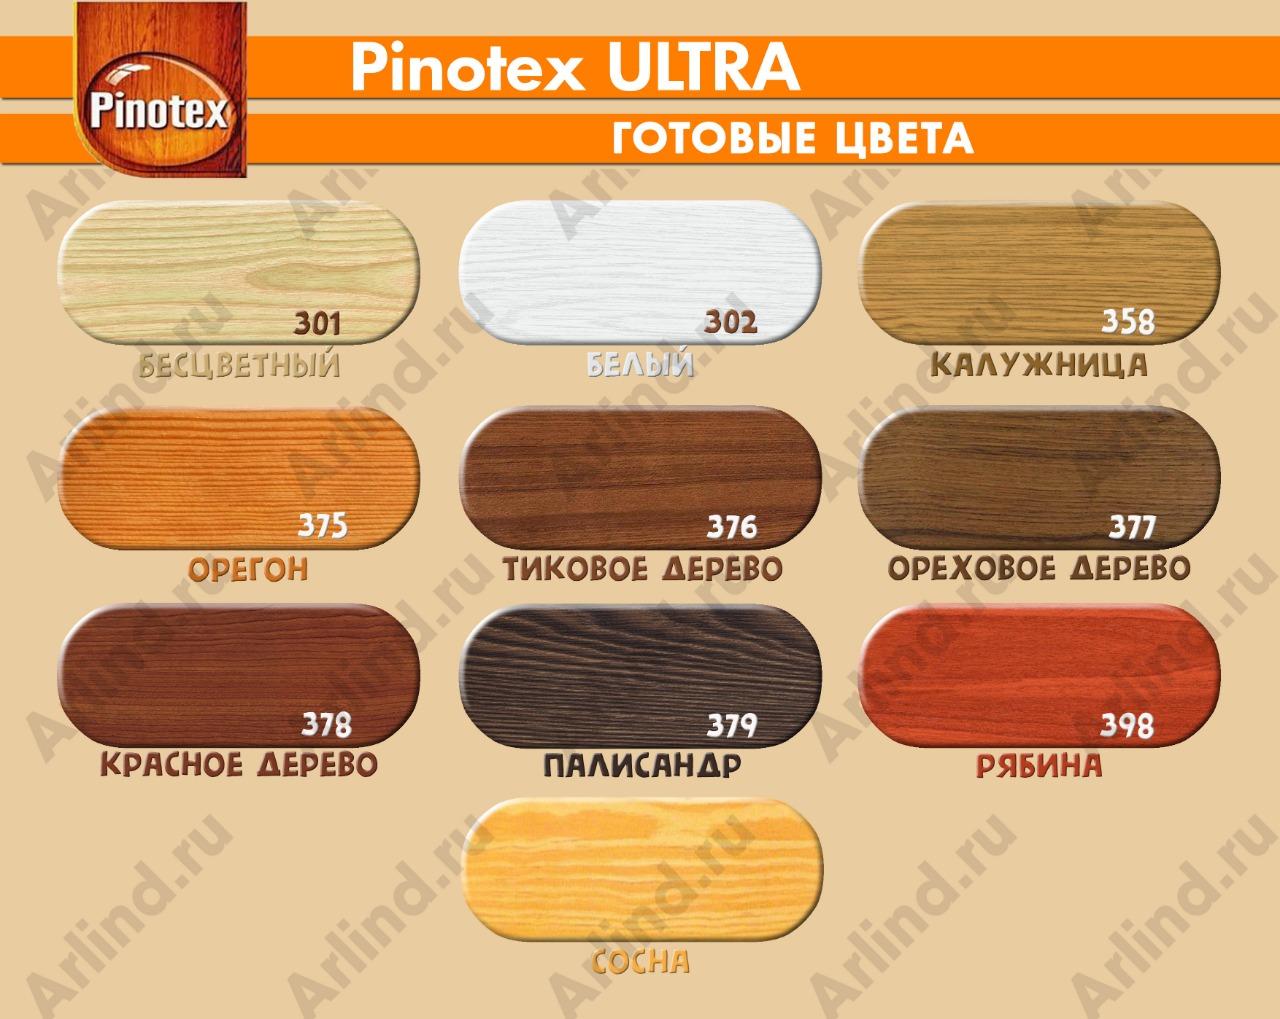 Цветовая палитра антисептика для дерева Pinotex Ultra с номерами цветов